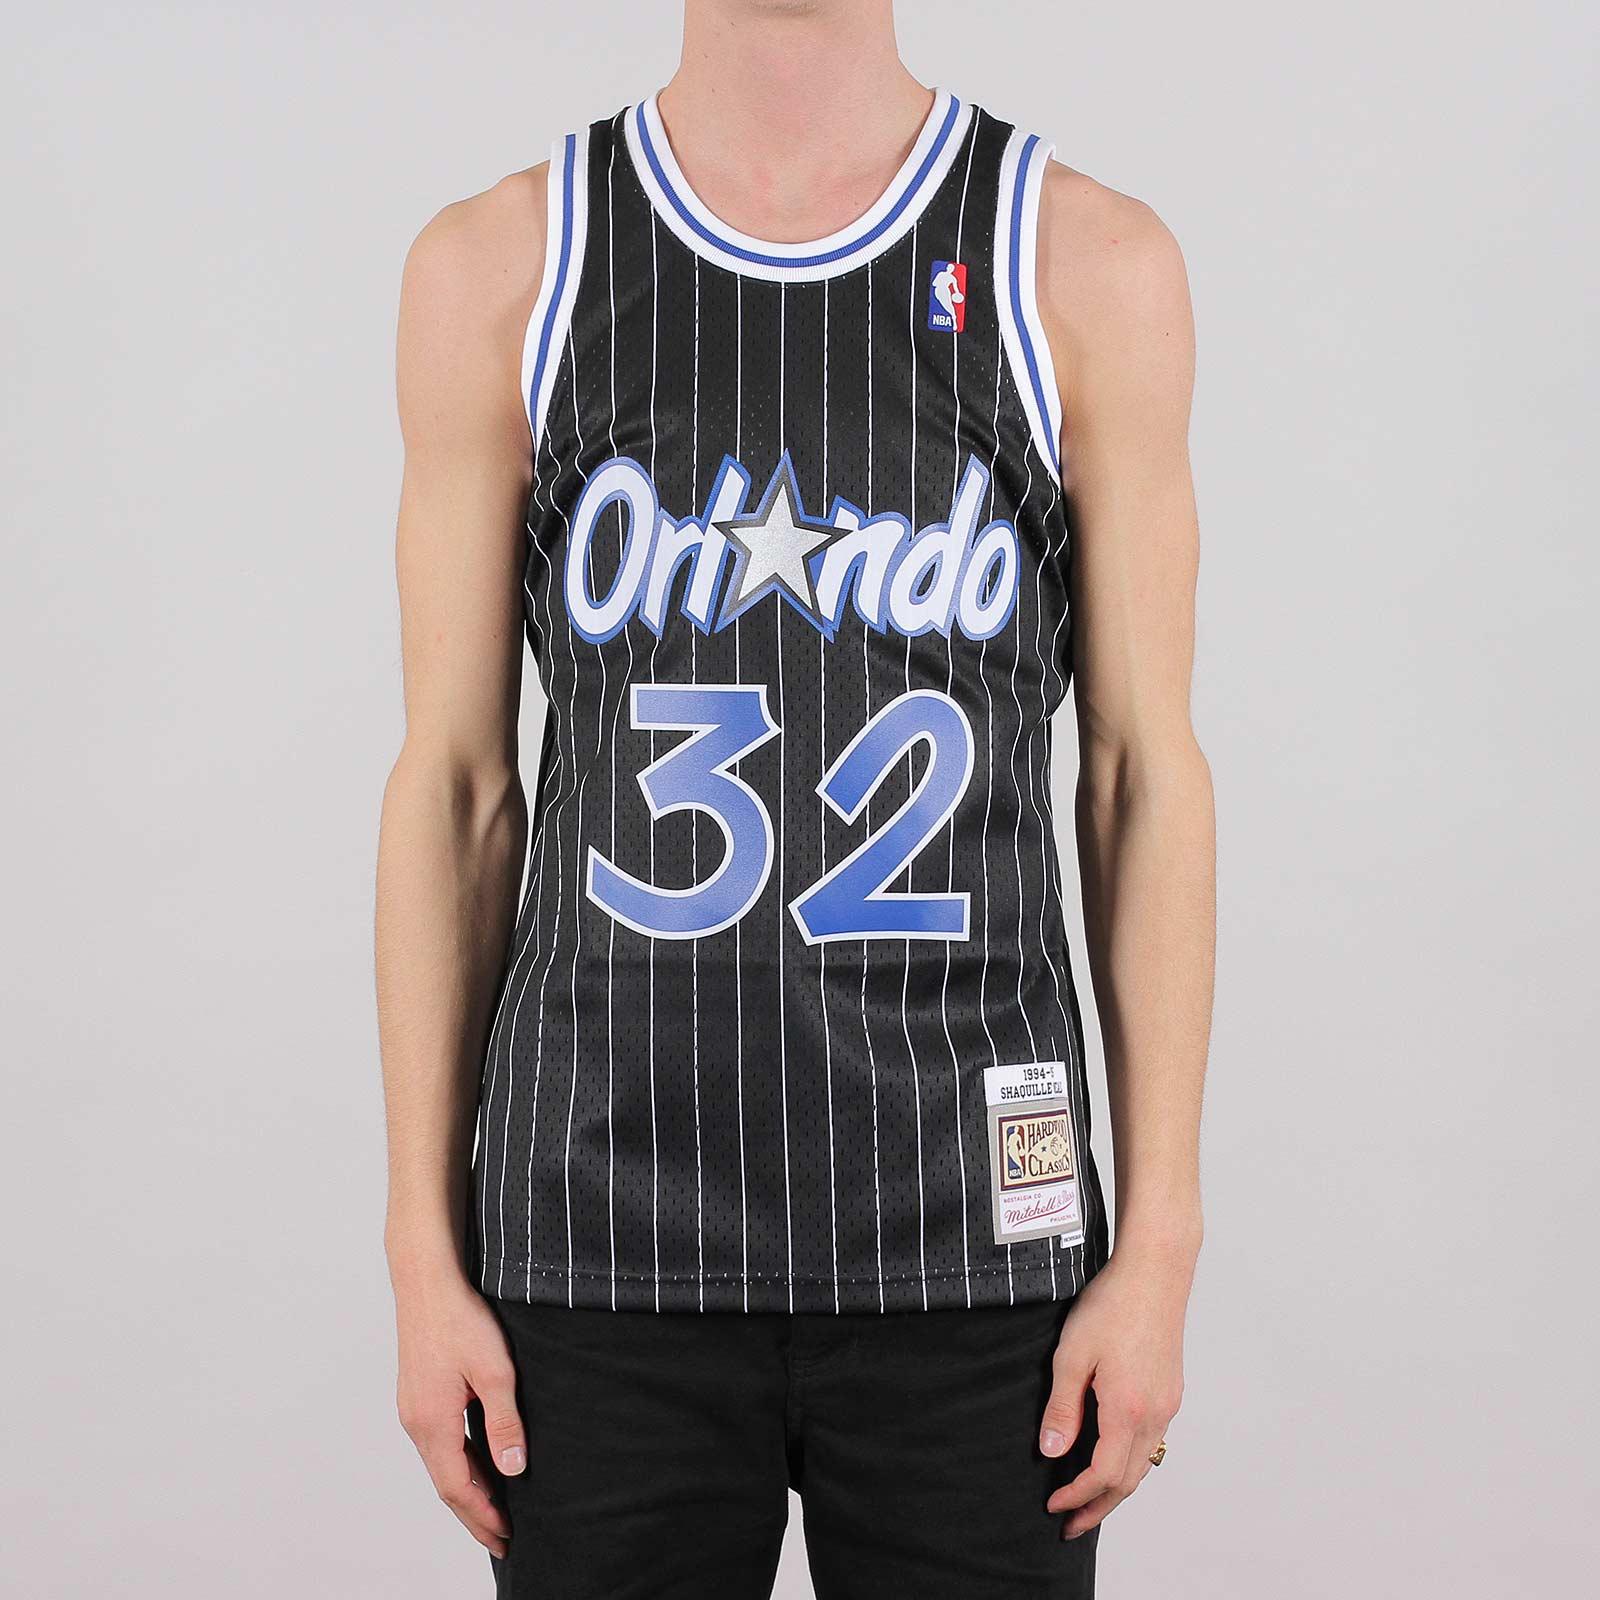 orlando magic shaq jersey, OFF 70%,Cheap price!